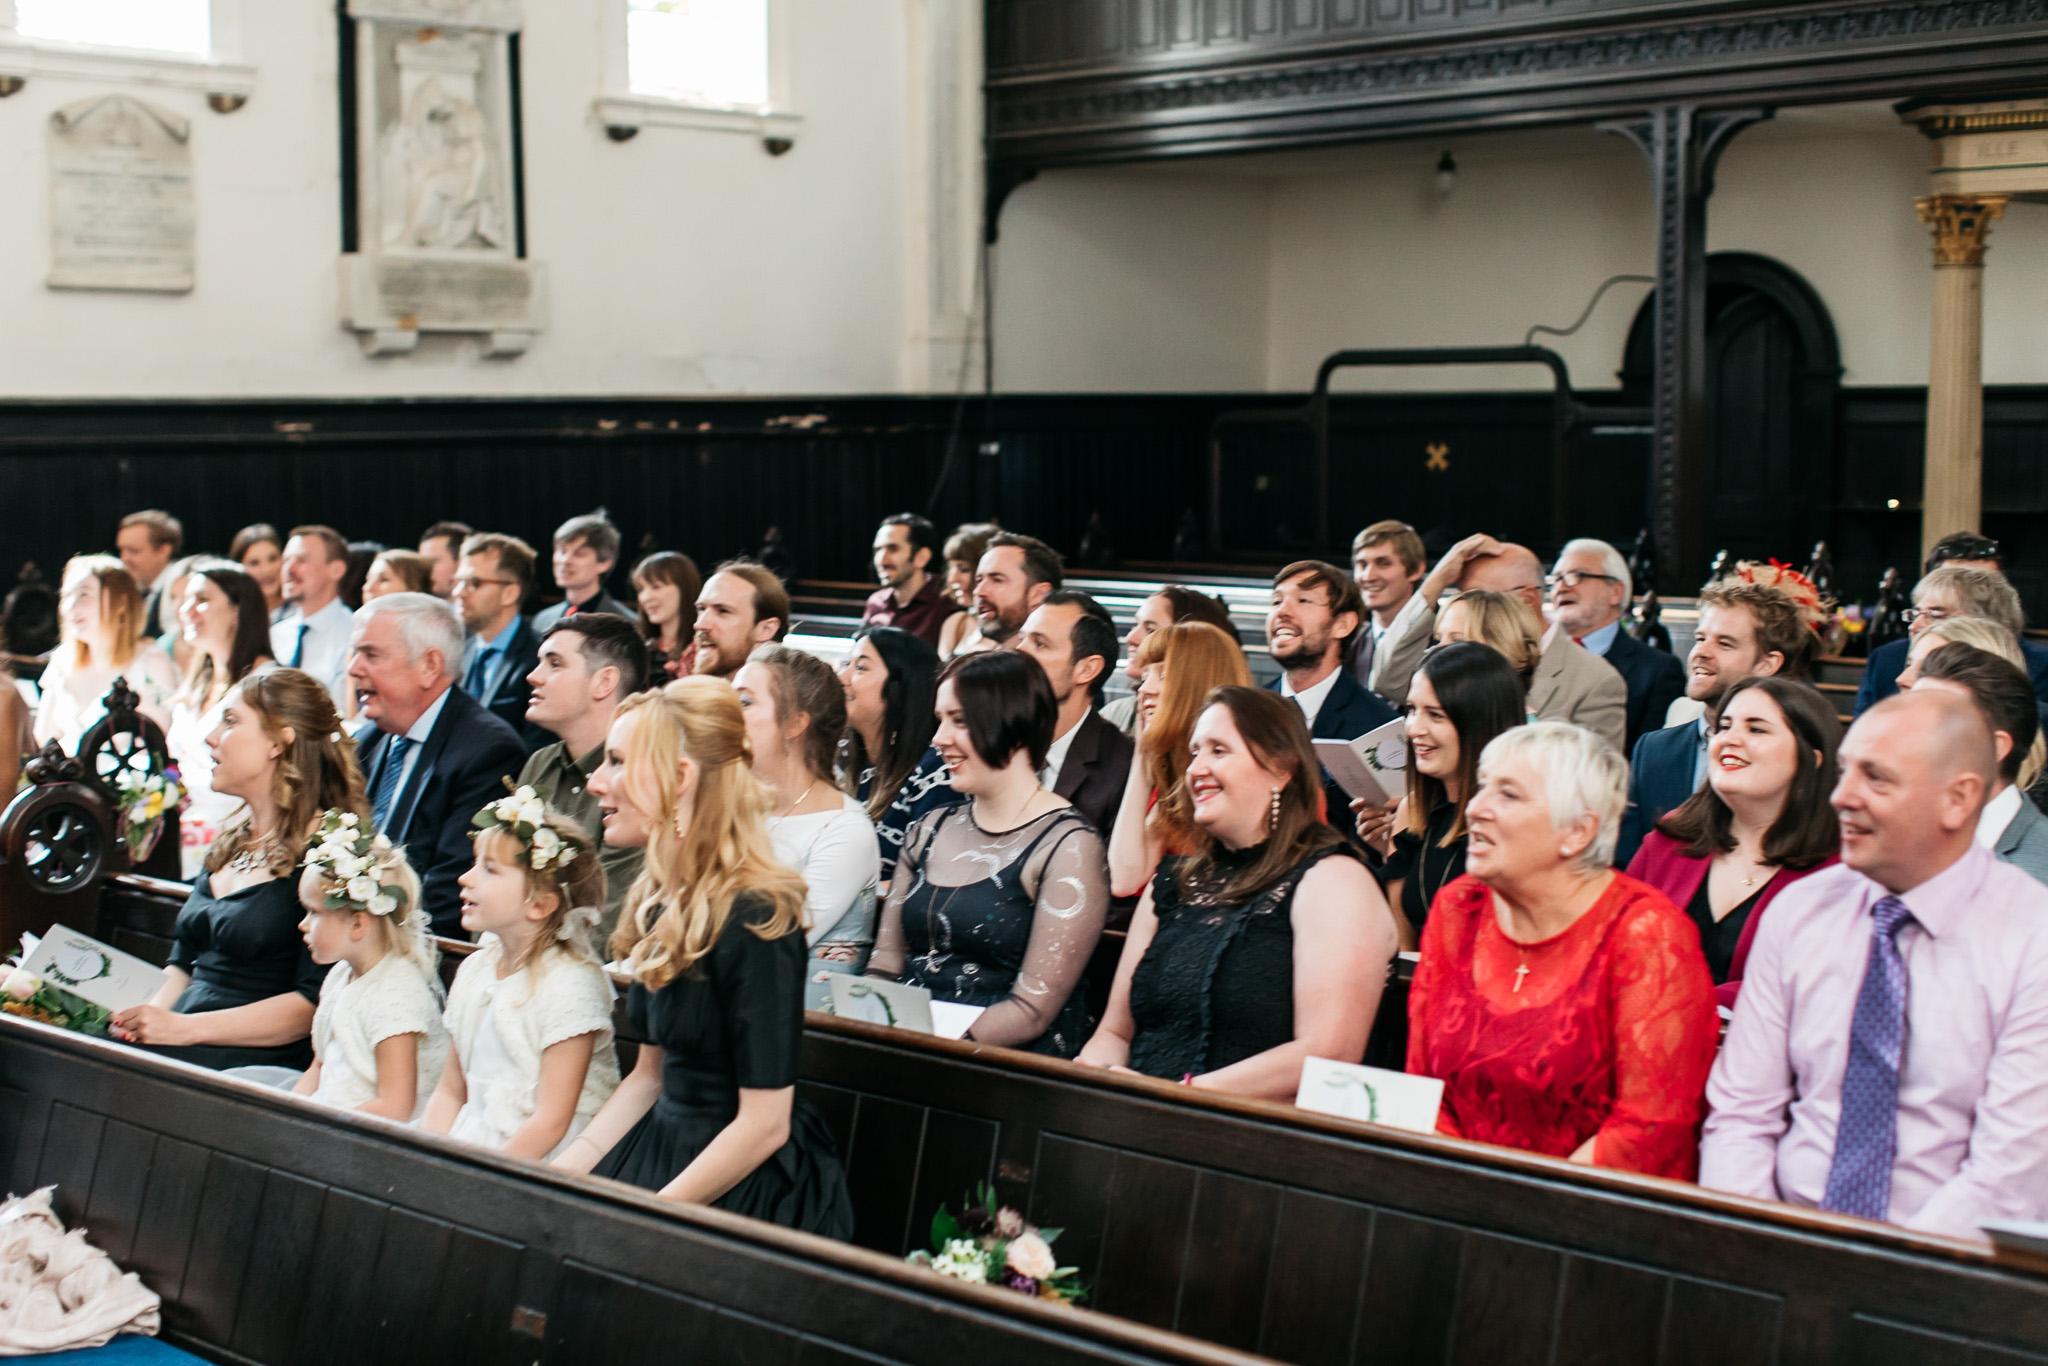 st_andrews_fabrica_brighton_wedding_555.jpg